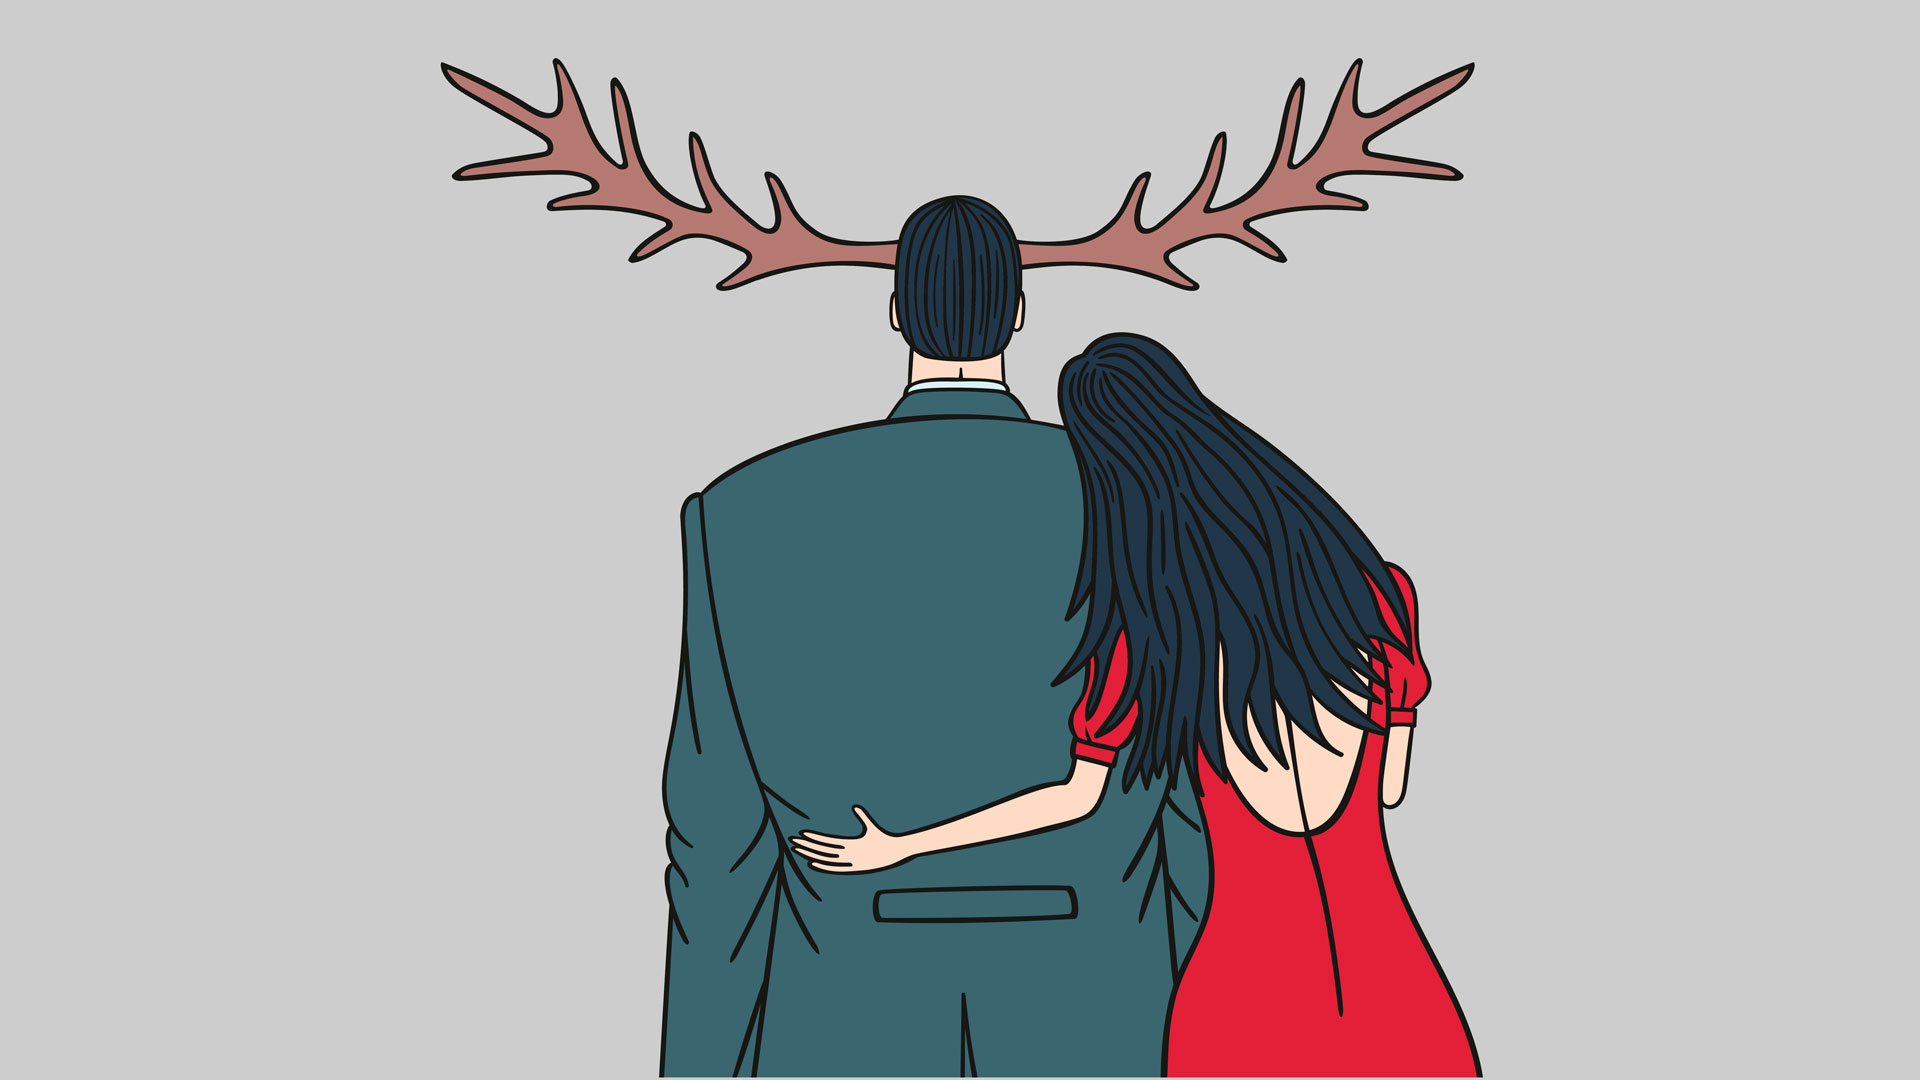 que se siente ser infiel a tu pareja